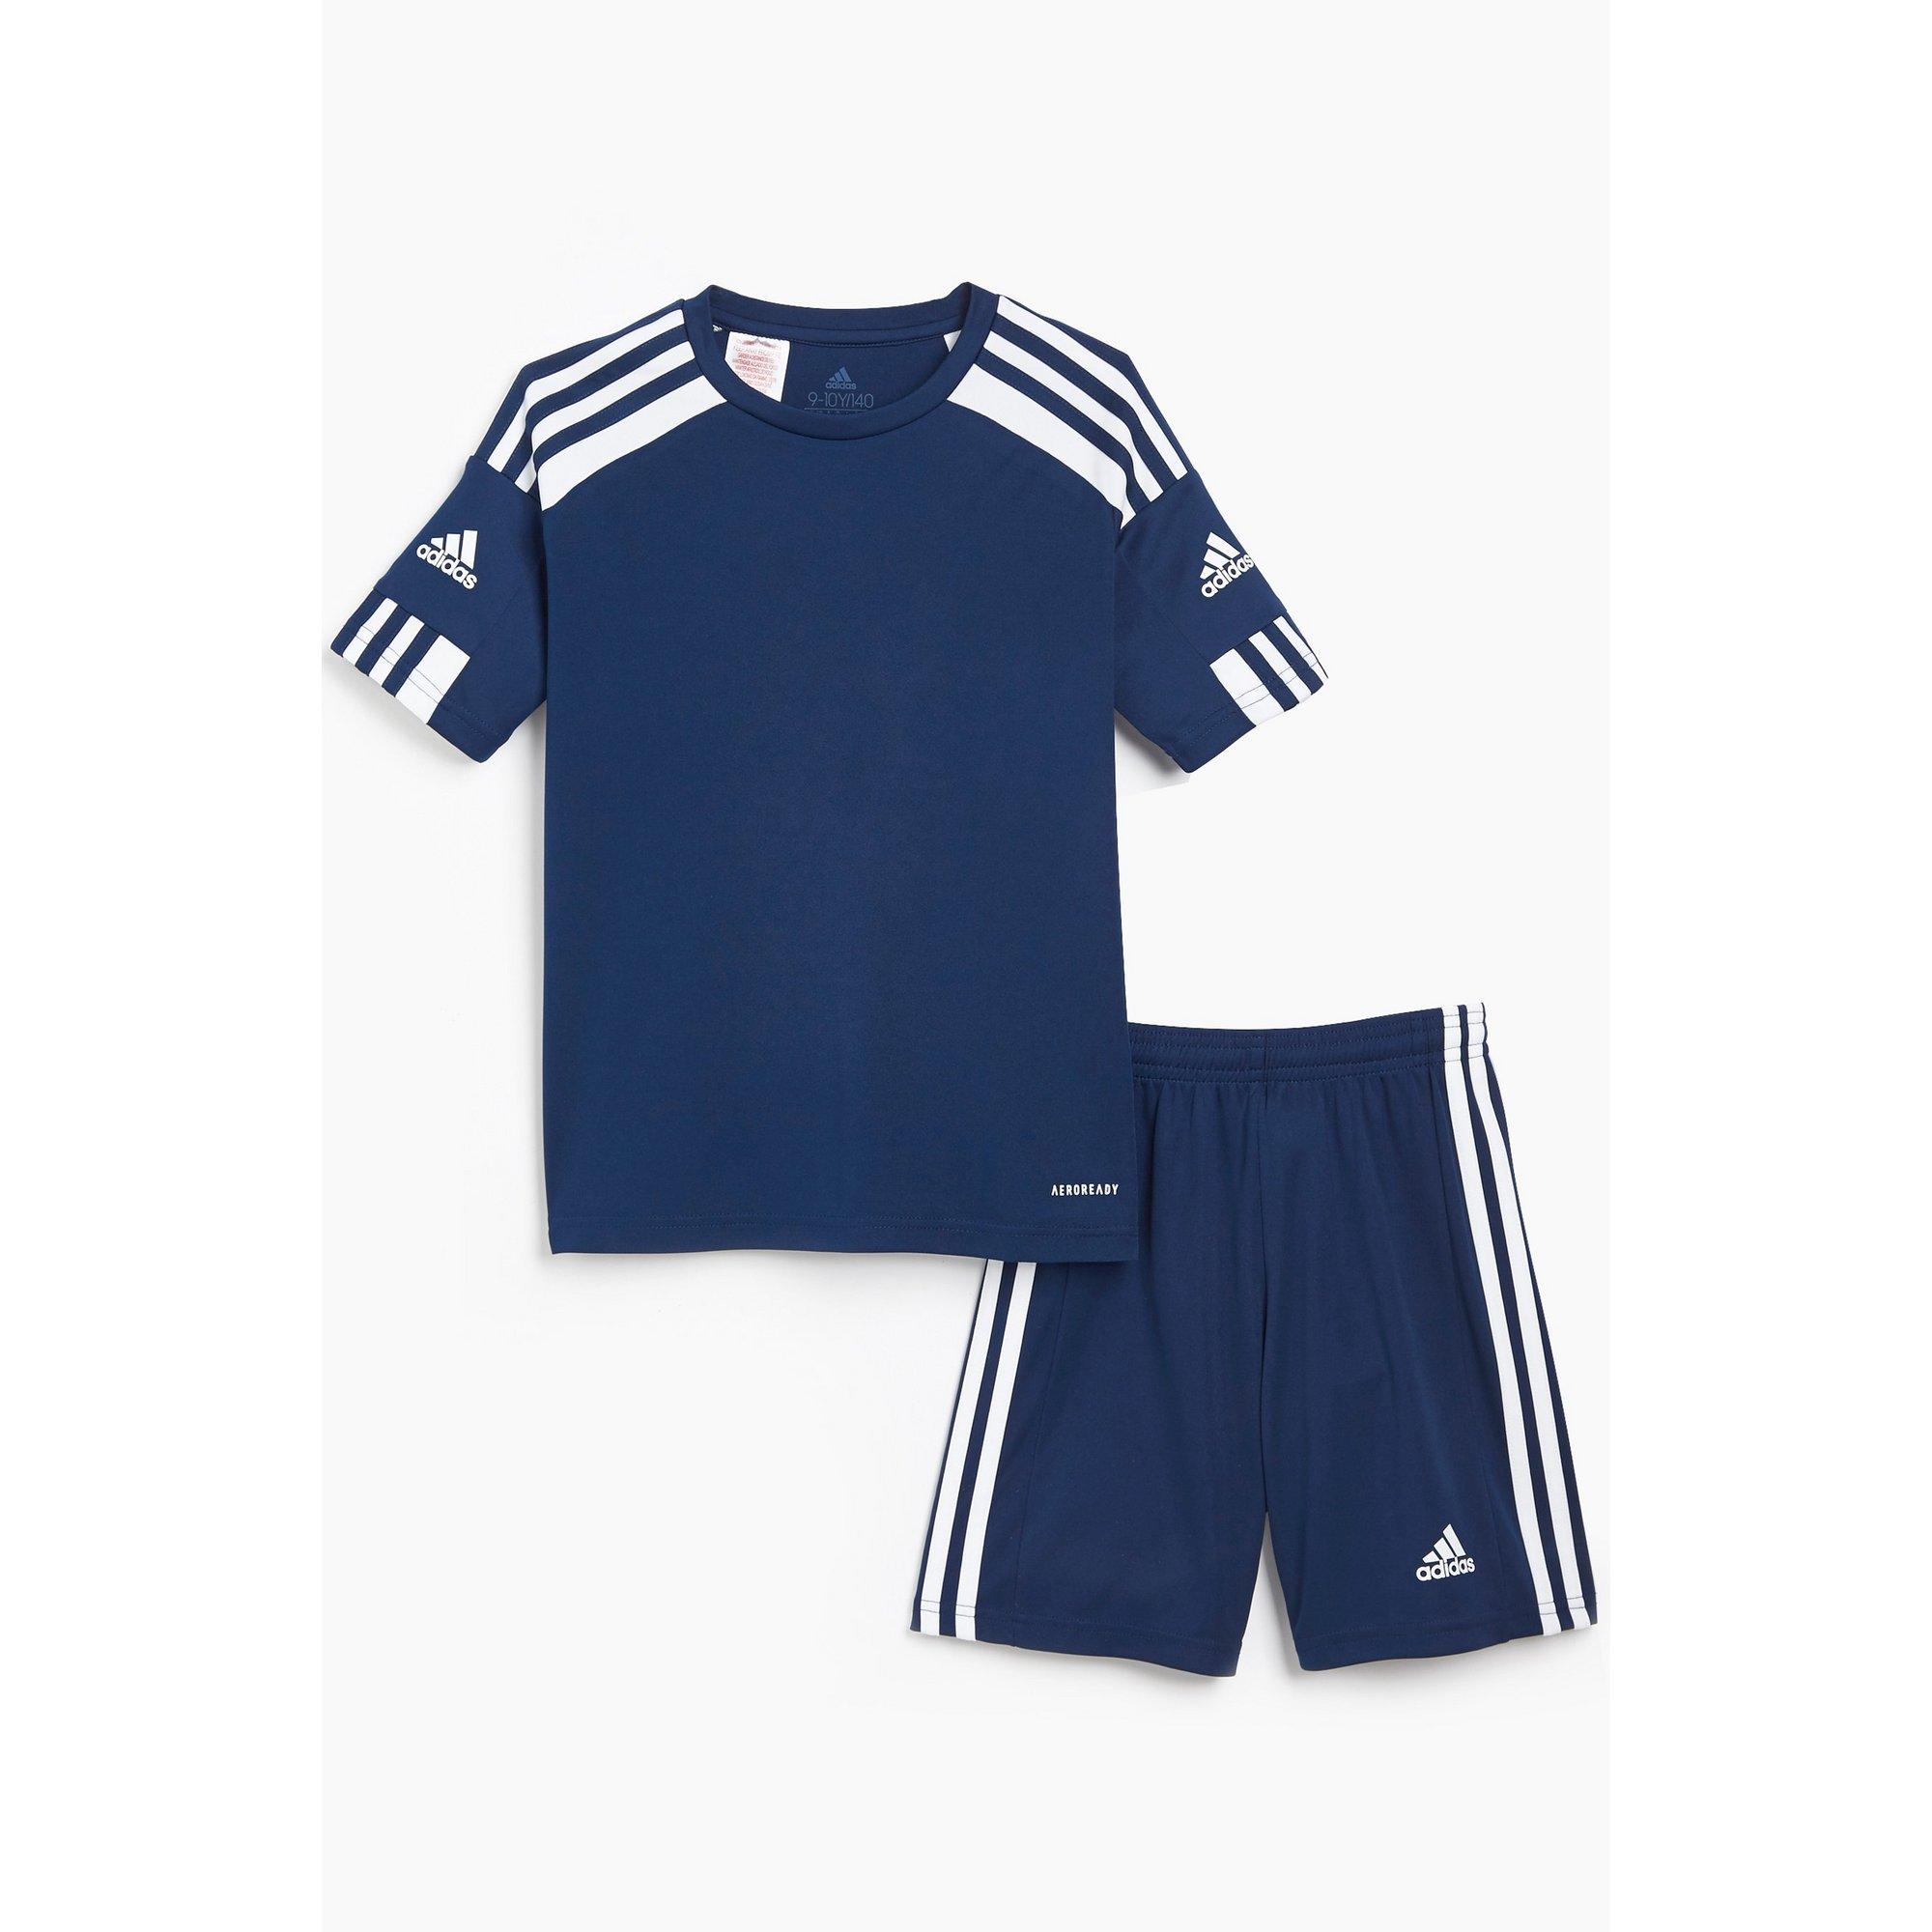 Image of Boys adidas Navy Squadra T-Shirt and Short Set